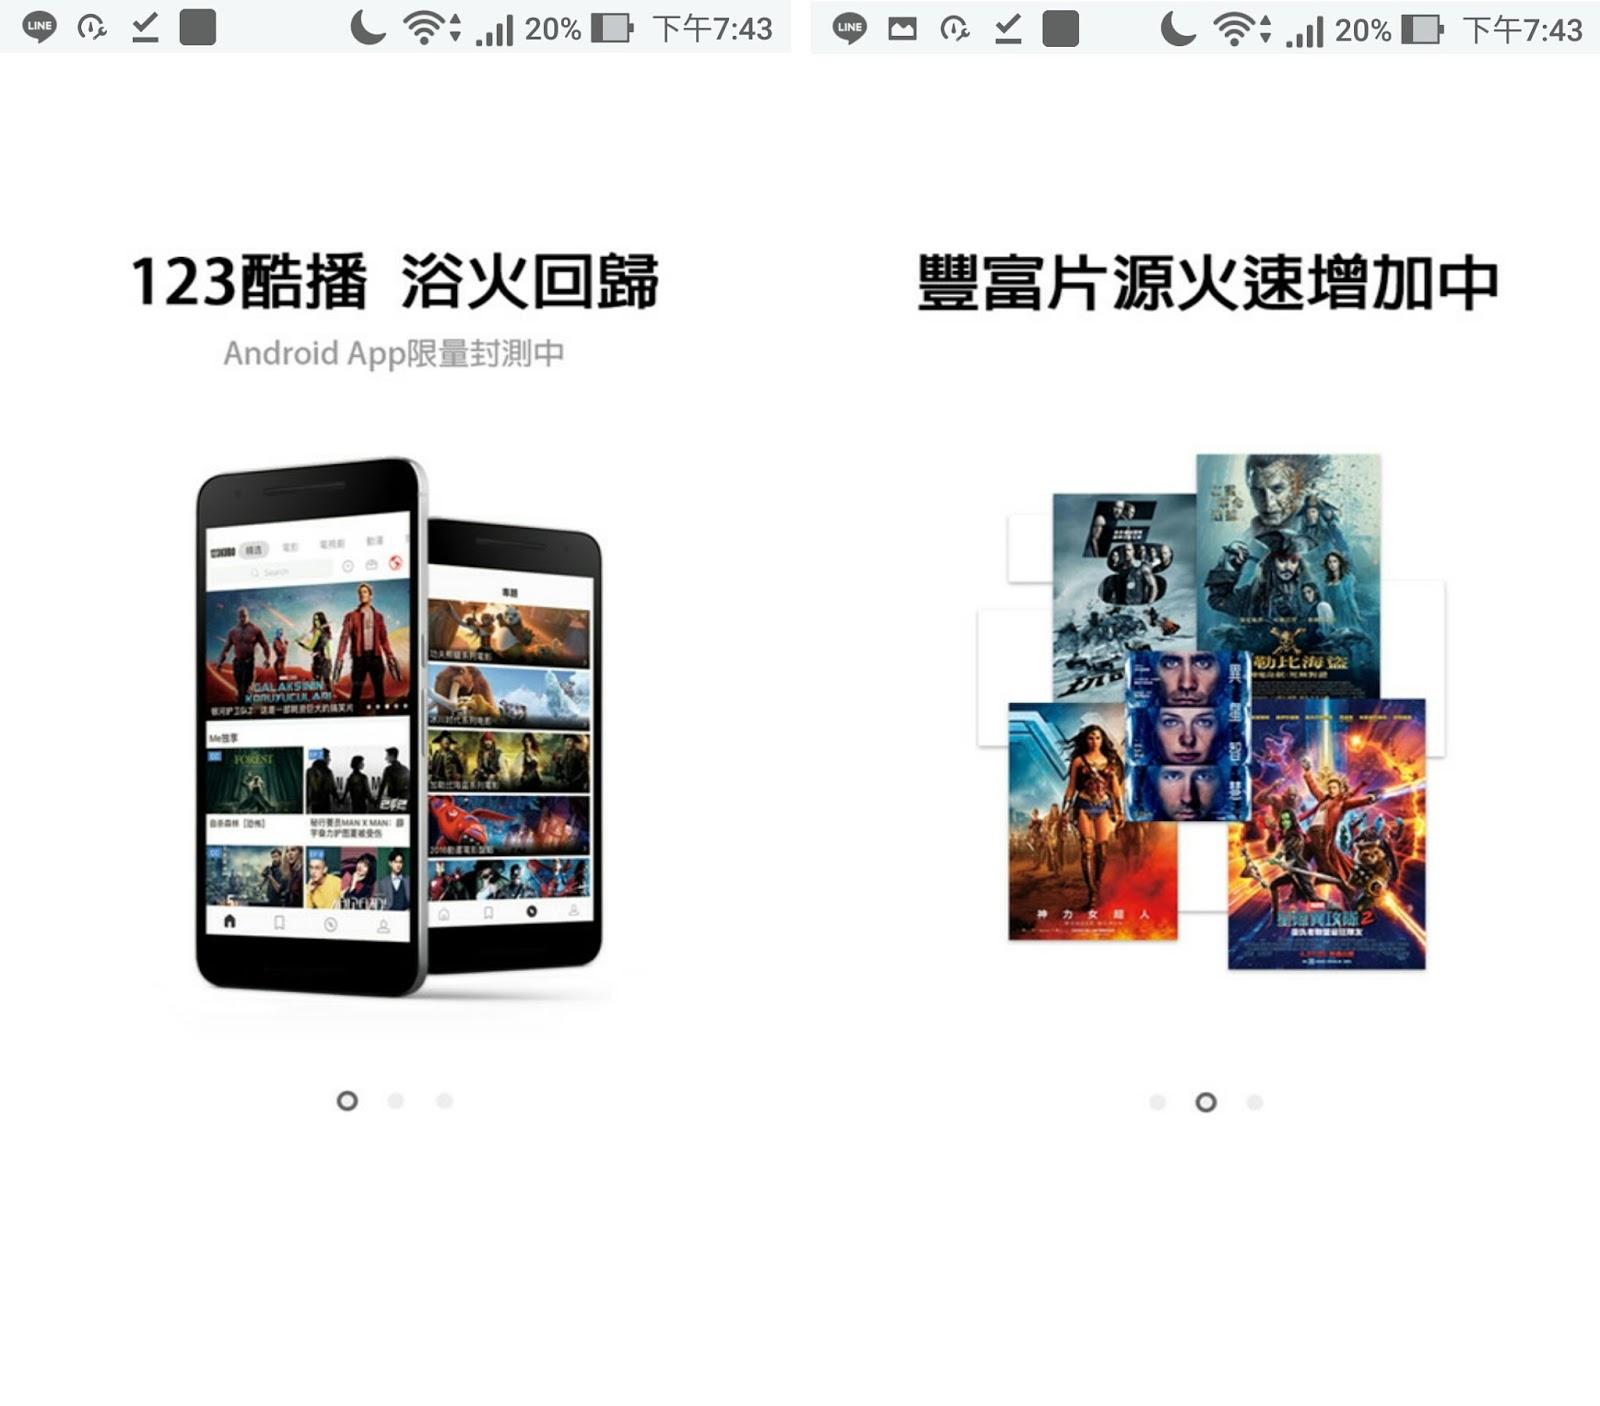 Screenshot 20170602 194303 - 酷播復活!《123Kubo》手機App,速度超快、片源豐富,還能下載離線撥放!